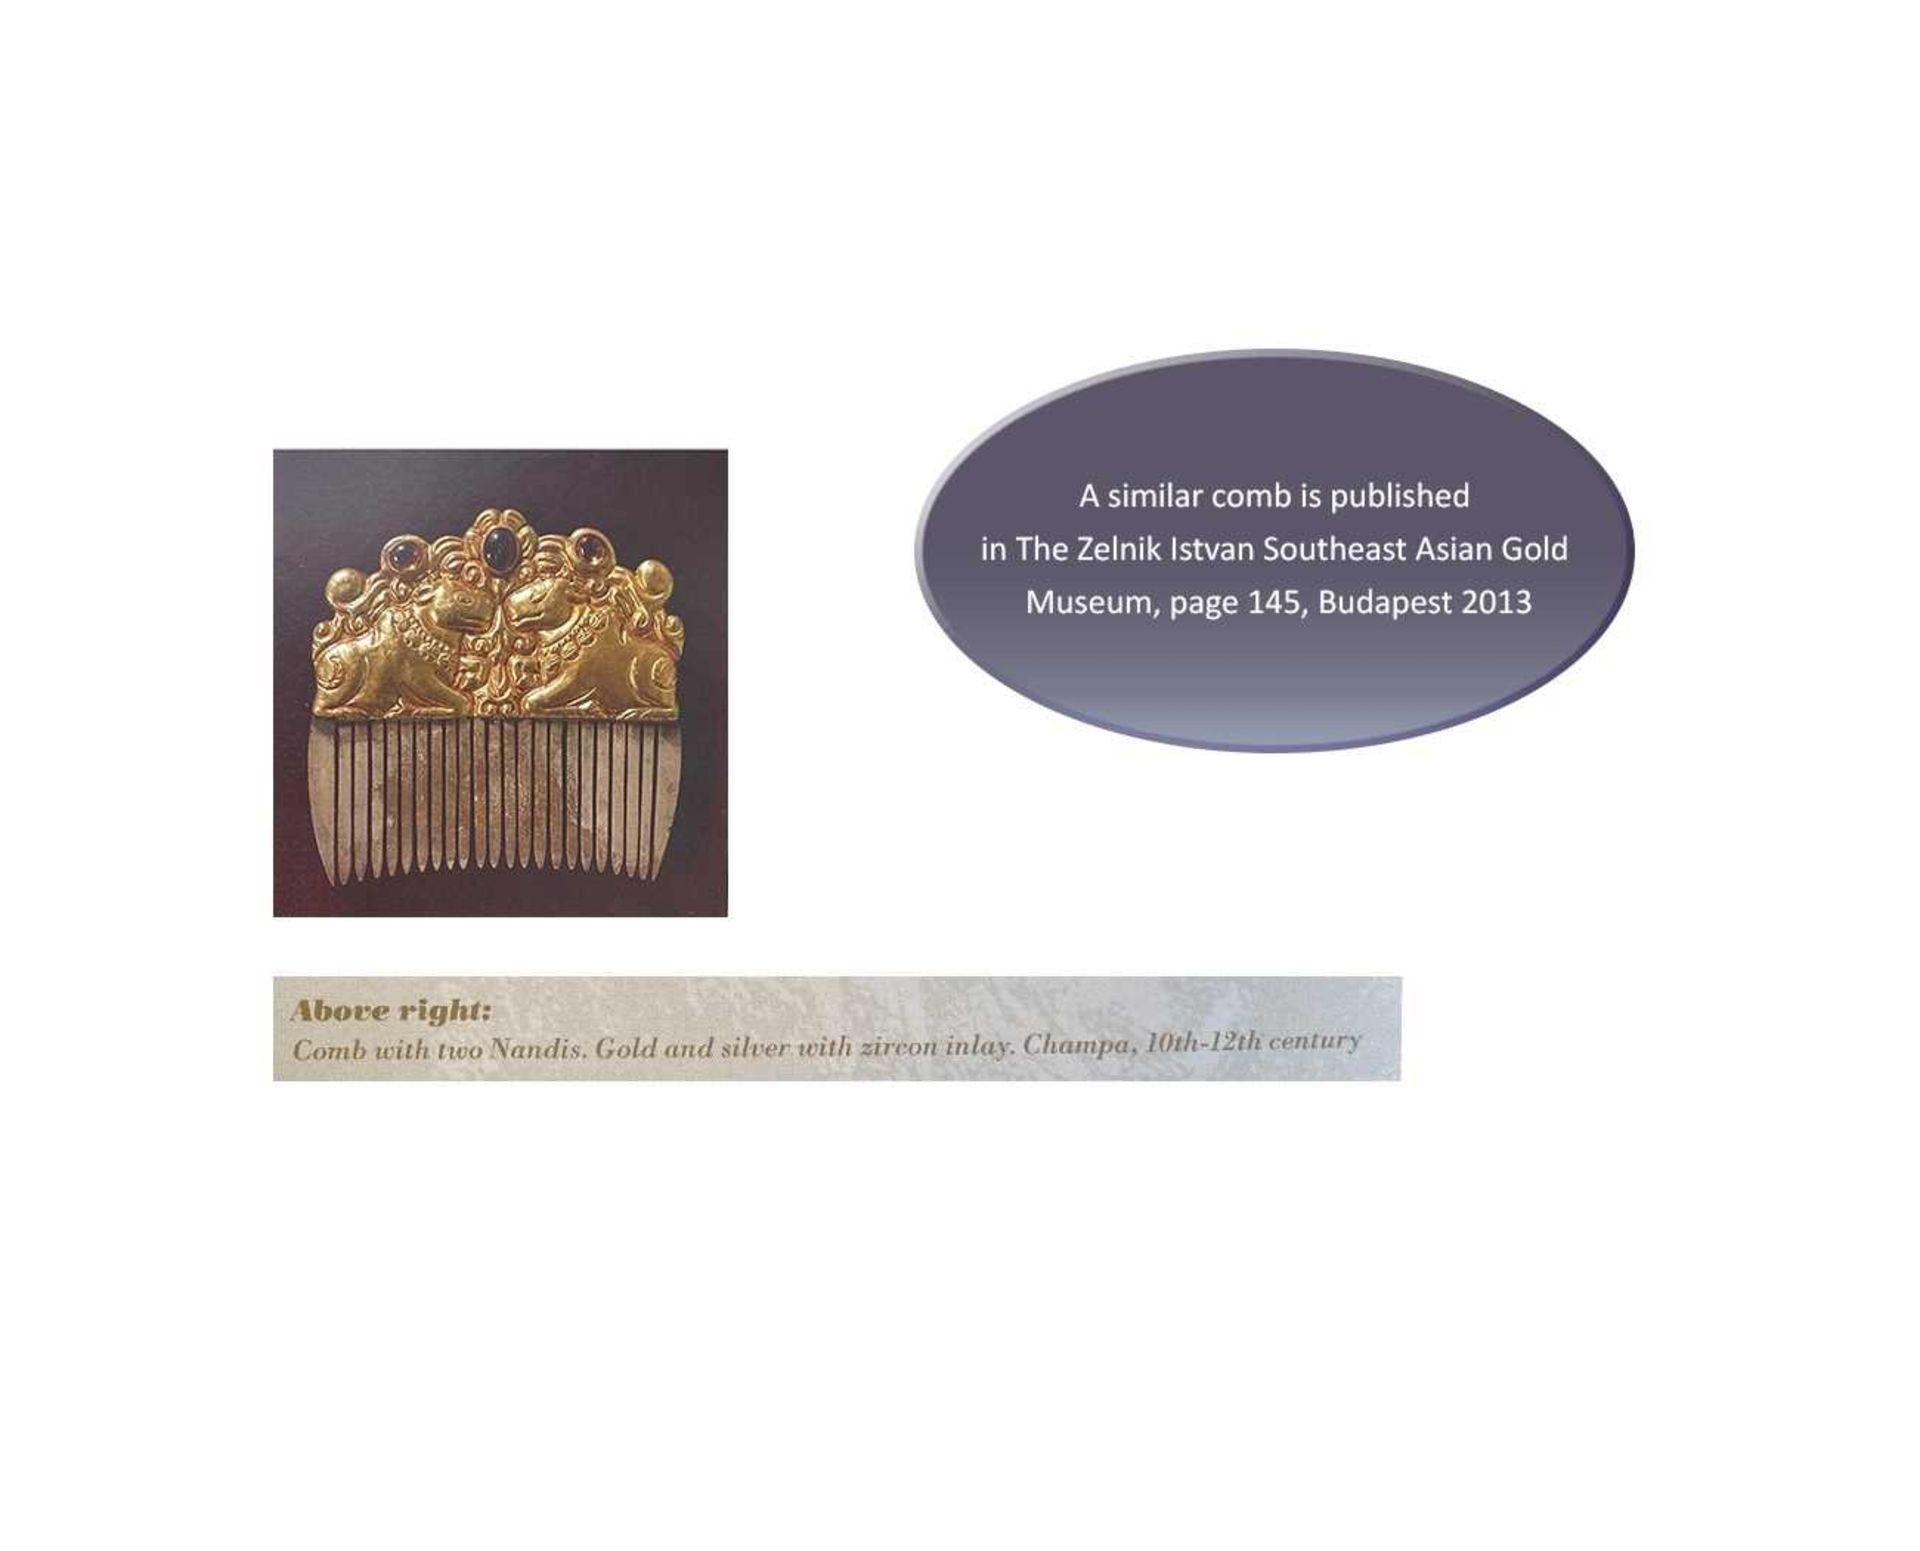 A CHAM GEMSTONE-SET GOLD REPOUSSÉ AND SILVER HAIR COMB WITH NANDI BULLS - Bild 5 aus 5